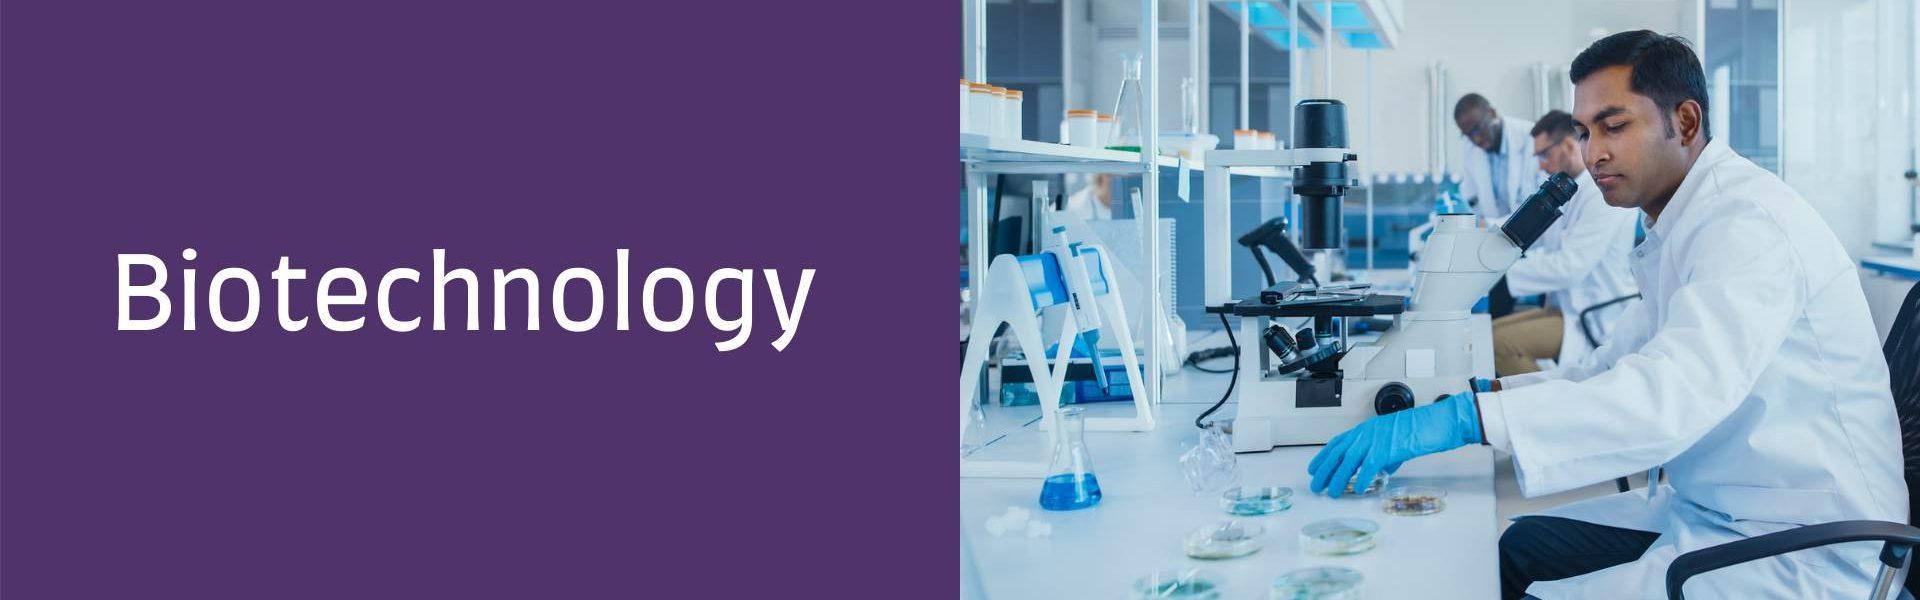 modern medical research laboratories